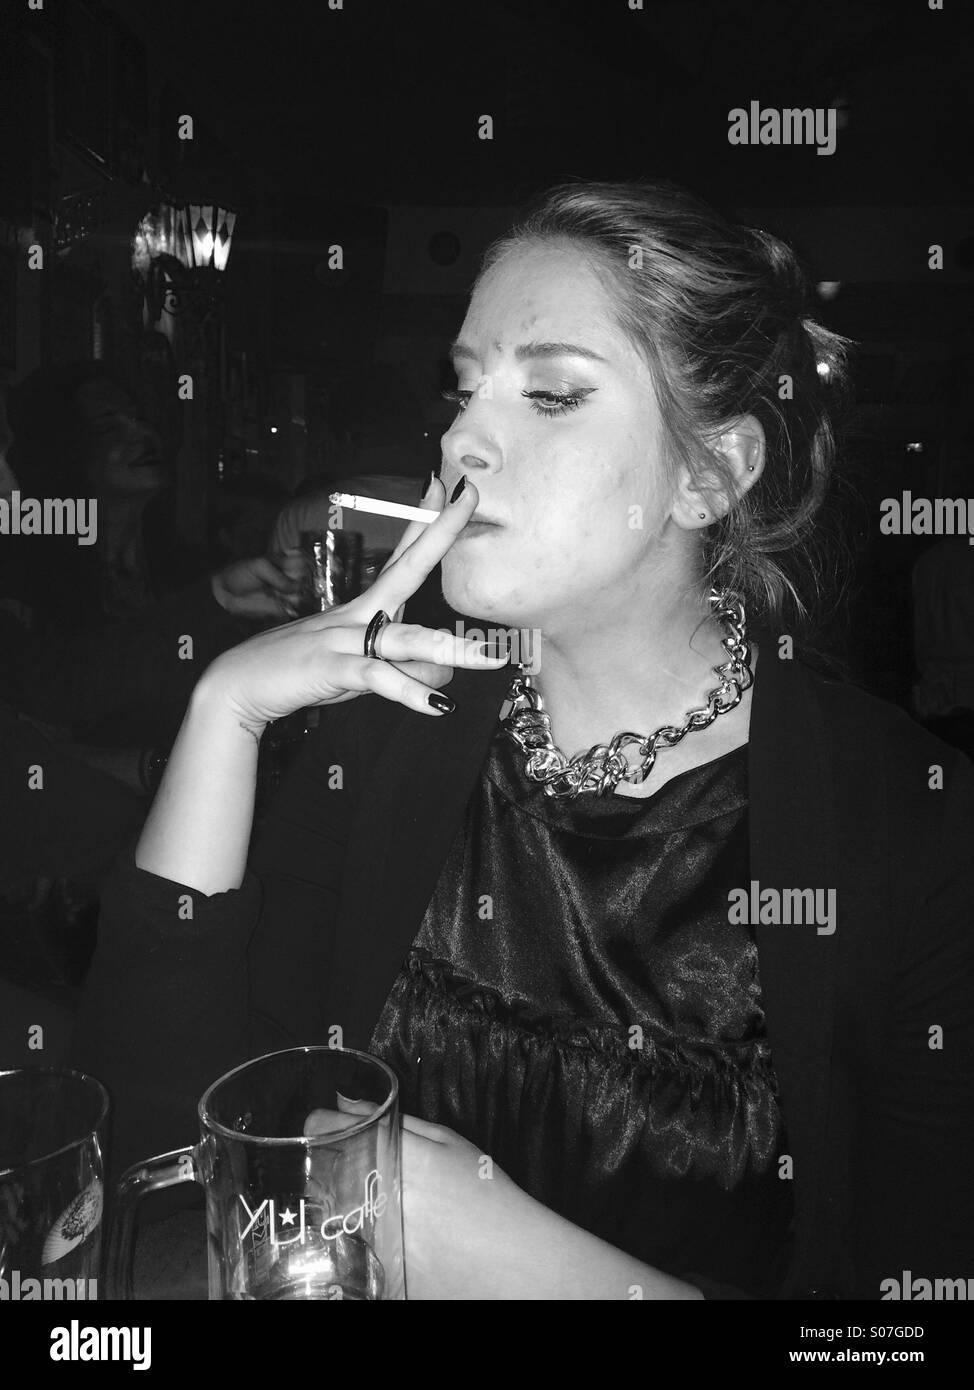 https://c1.alamy.com/comp/S07GDD/girl-smoking-cigarett-S07GDD.jpg